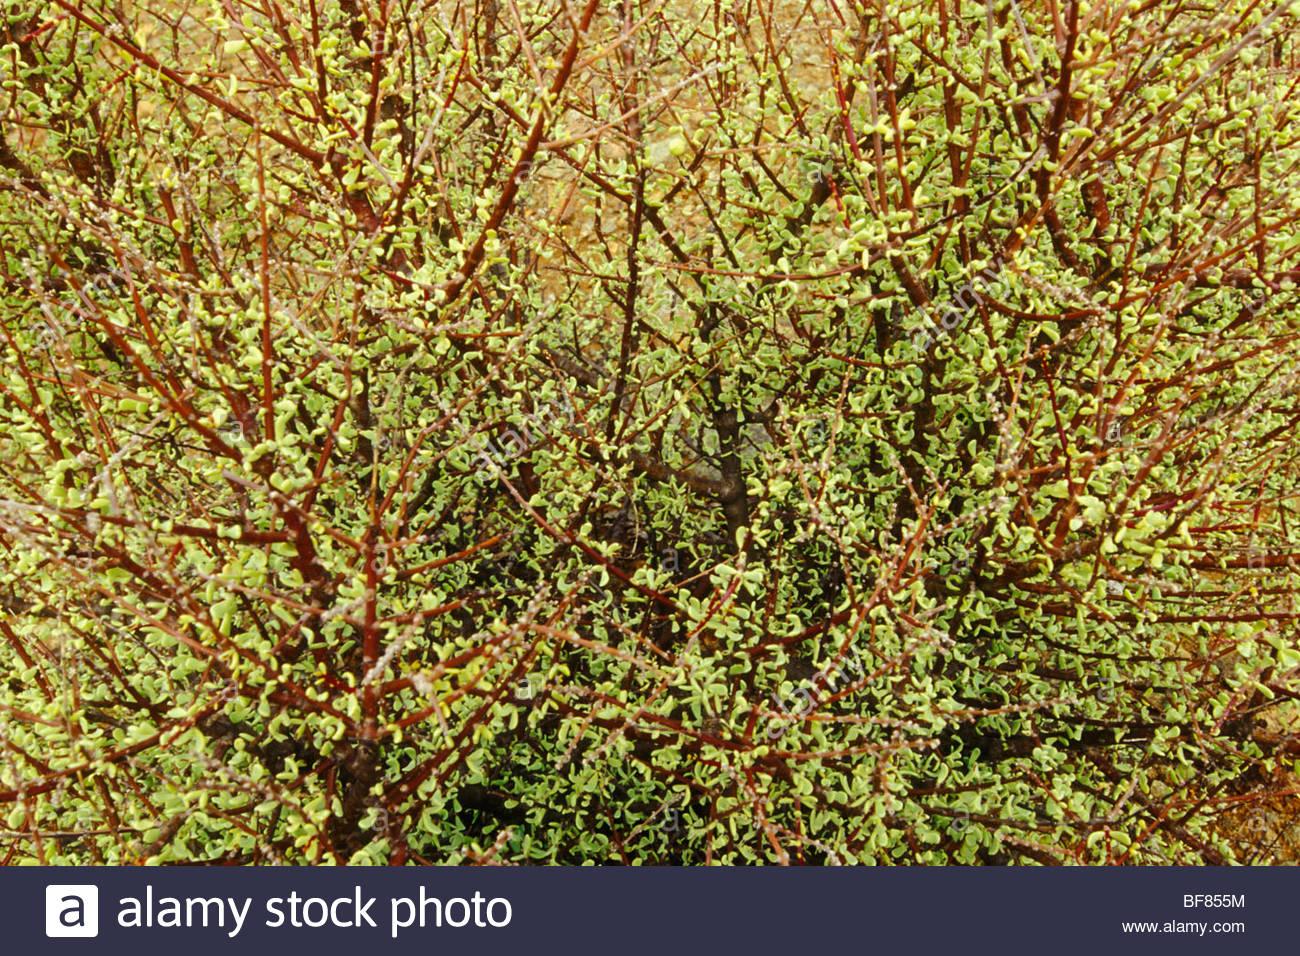 Succulent shrub, Ceraria namaquensis, Richtersveld National Park, South Africa - Stock Image